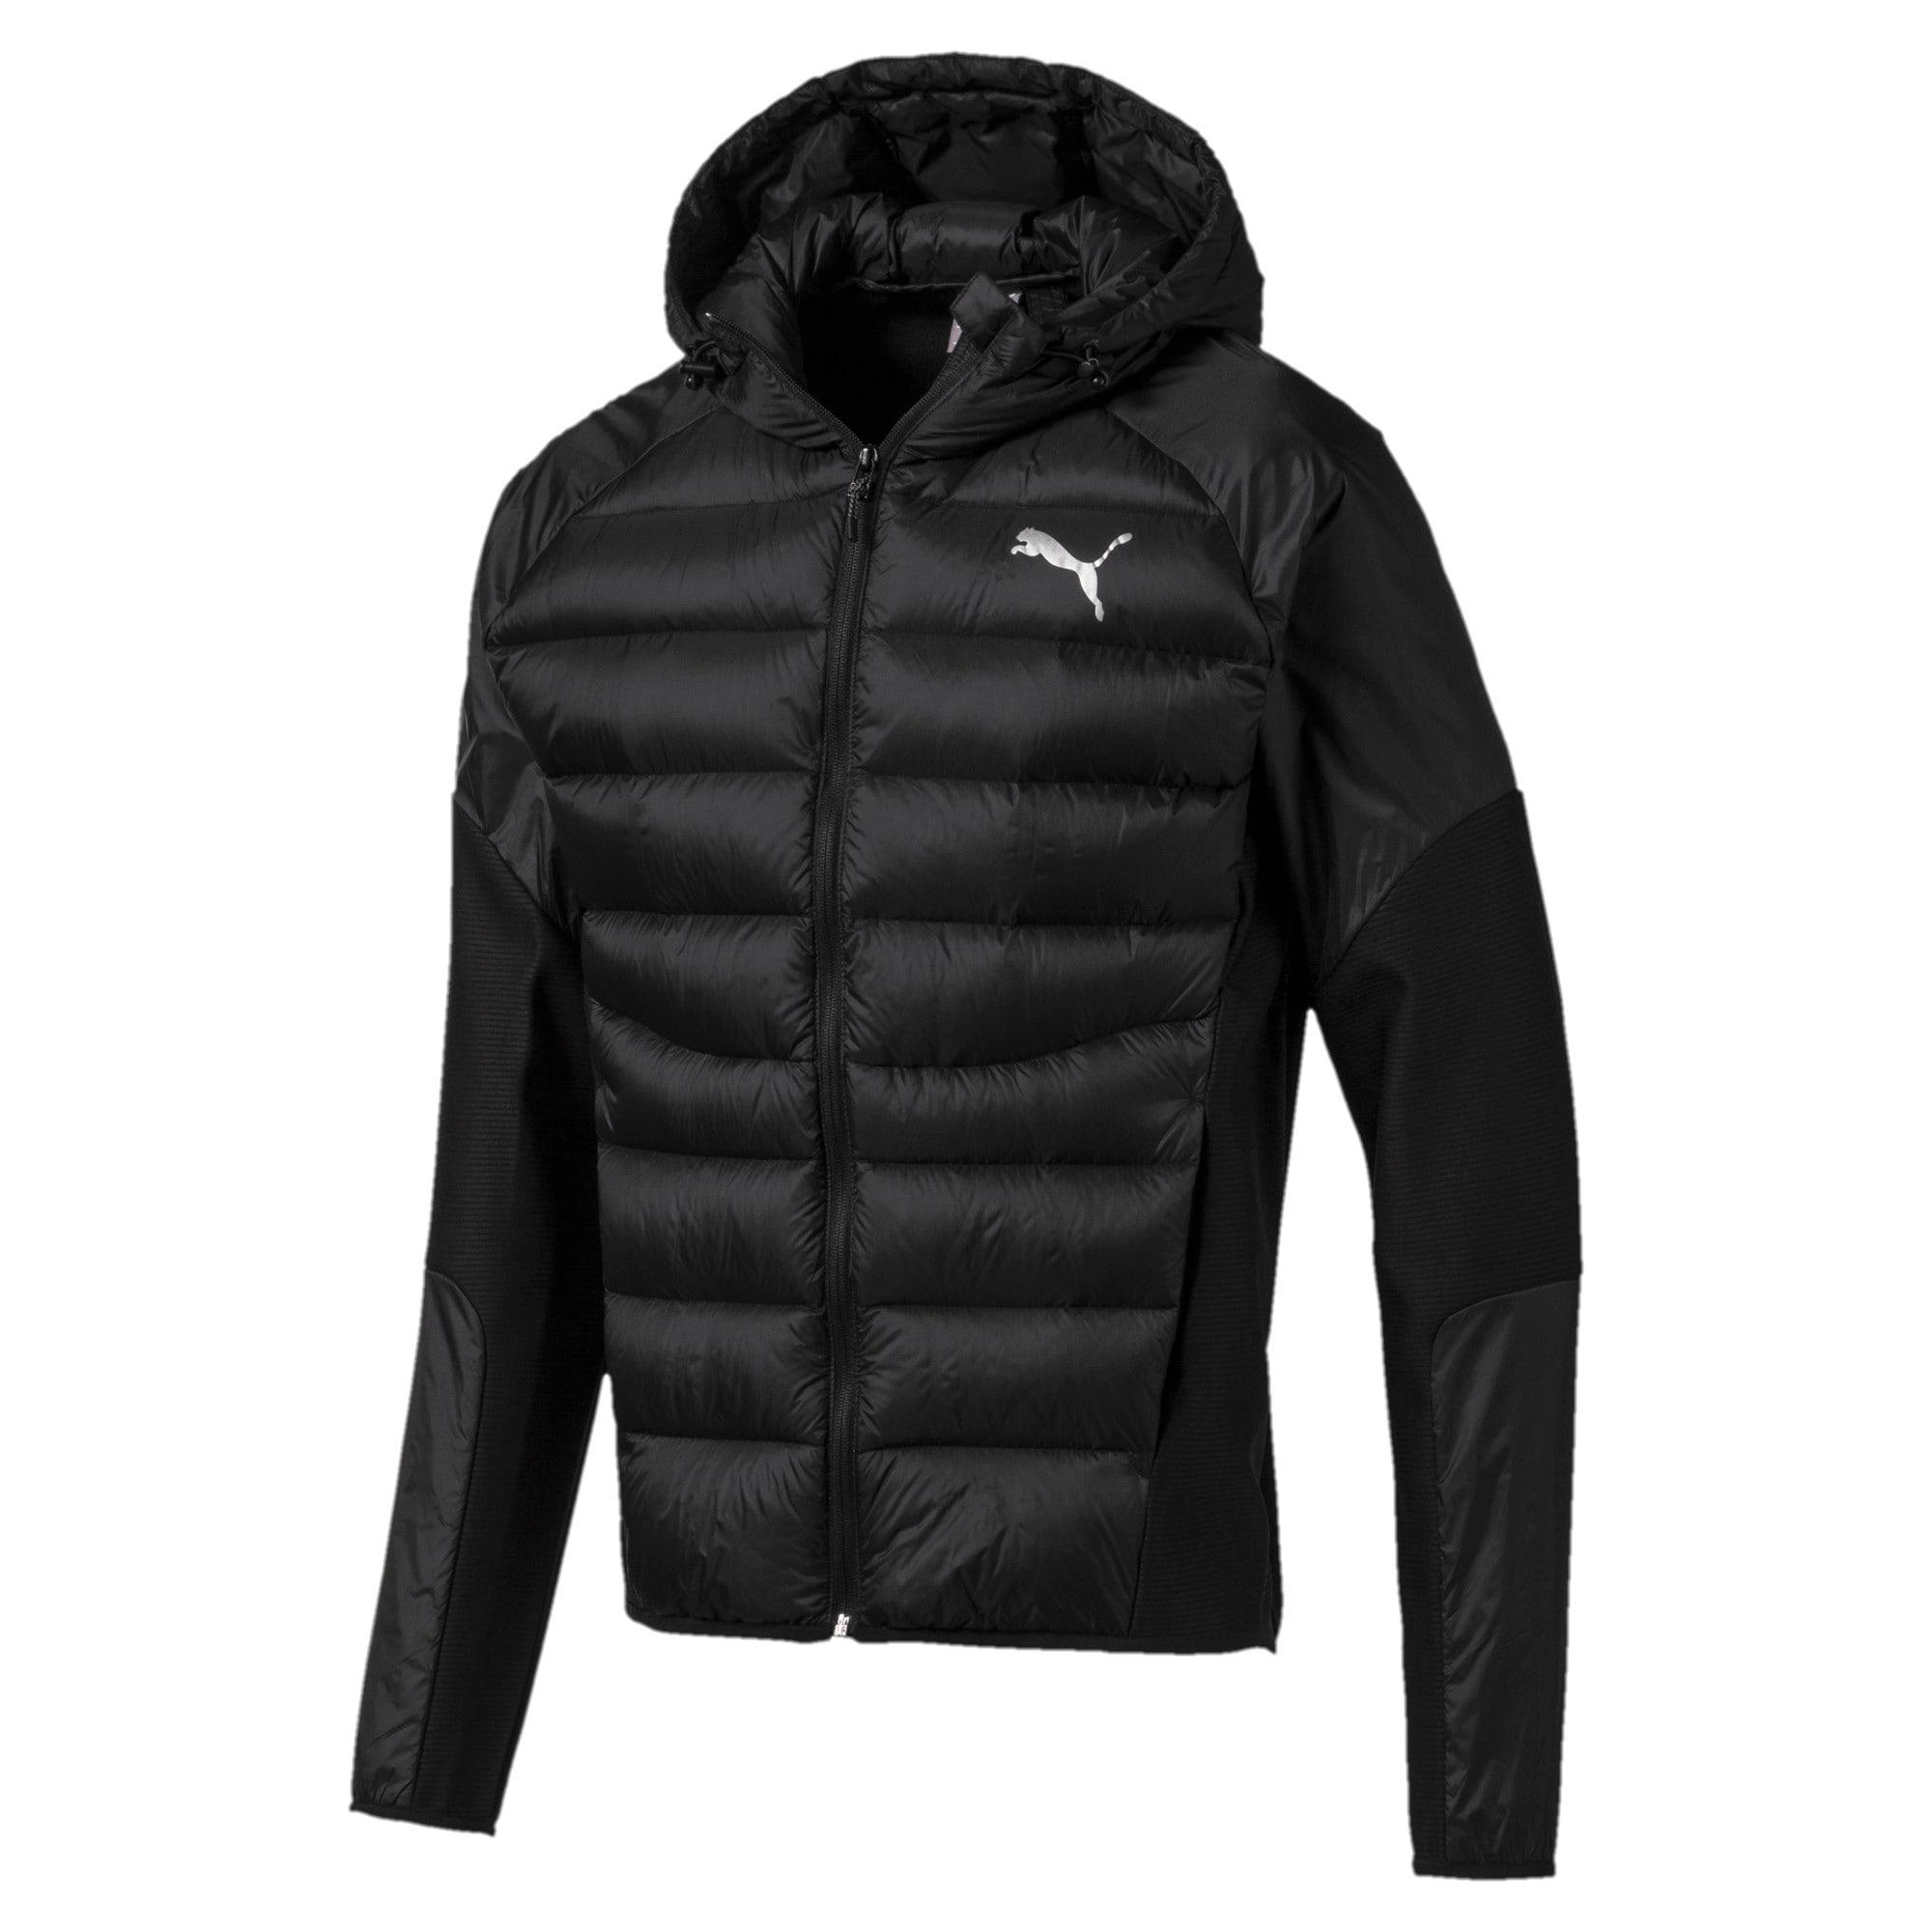 Thumbnail 4 of 600 Hybrid Down Men's Jacket, Puma Black, medium